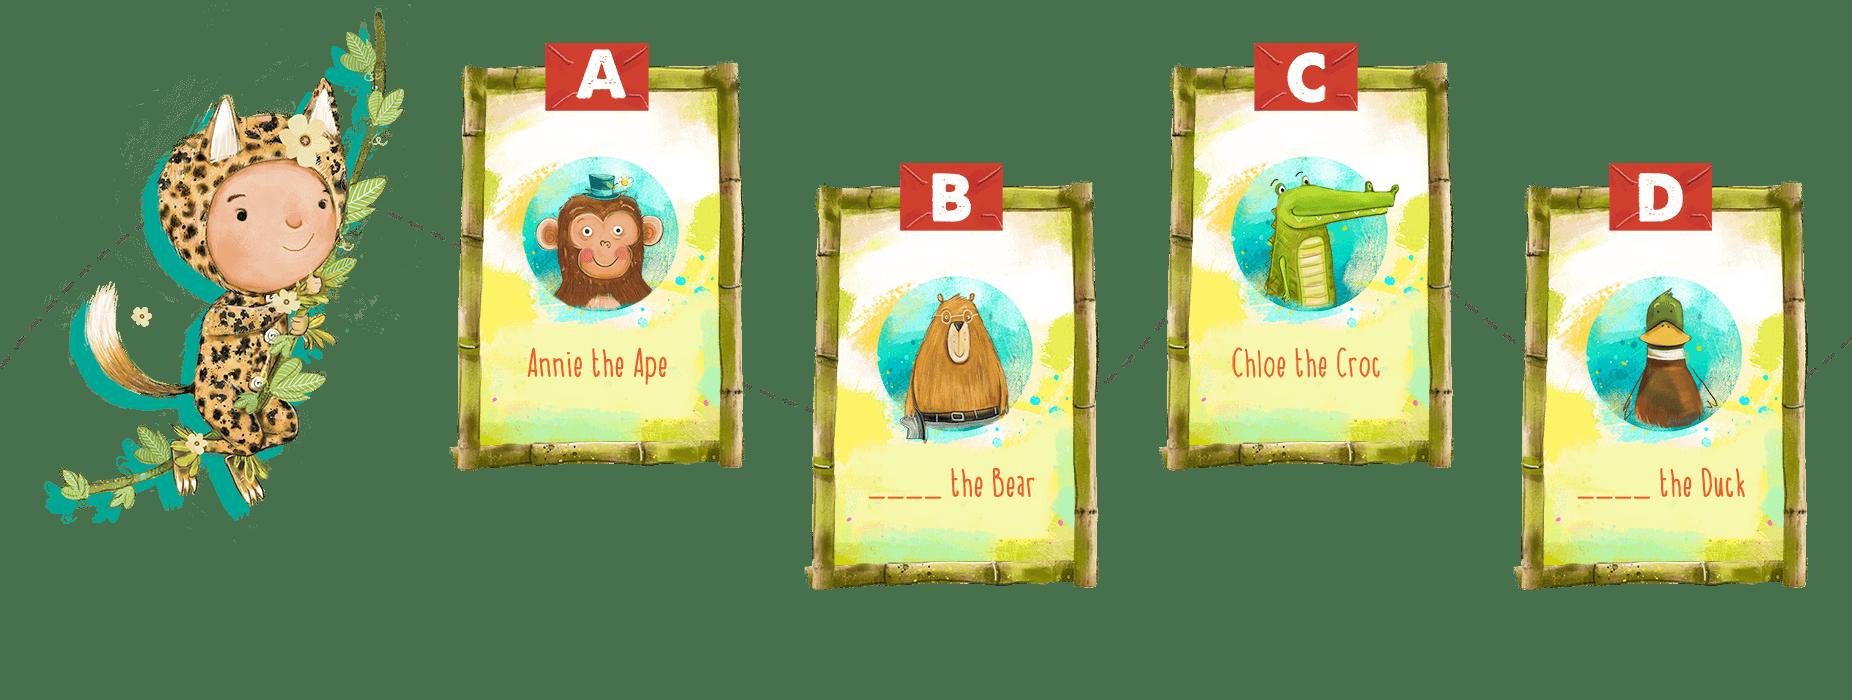 abc-jungle-characters